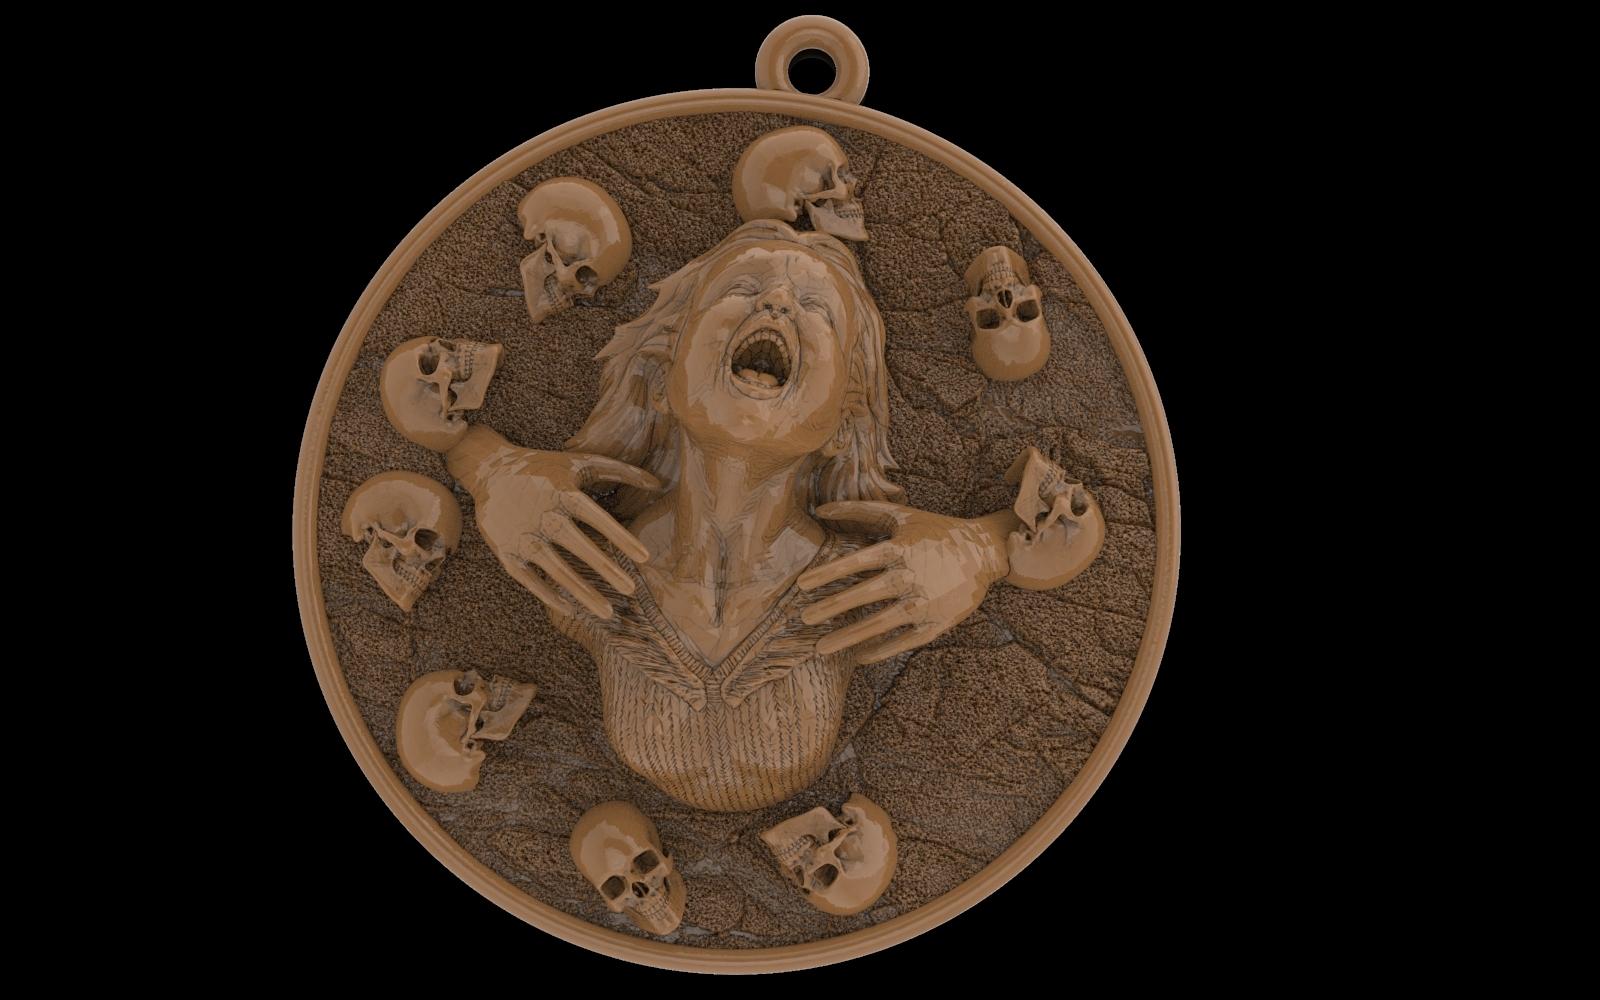 2.jpg Download free STL file Girl head with skulls pendant medallion jewelry 3D print model • 3D printing template, Cadagency